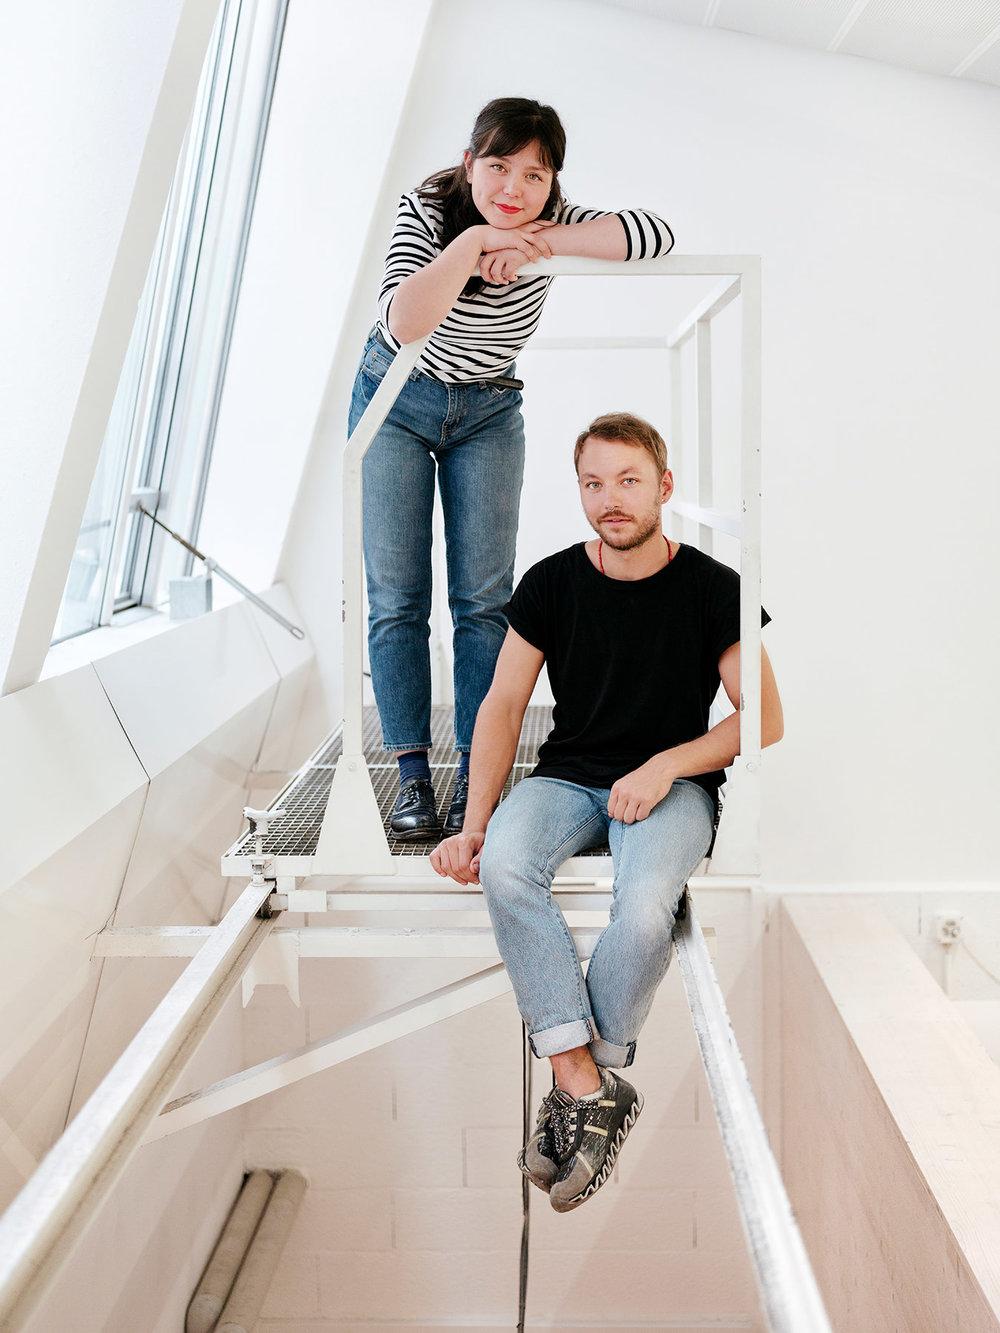 Designers Shizuka Saito and Valentin Dubois from Atelier Baltik in Geneva, Switzerland. Shot for IDEAT magazine.